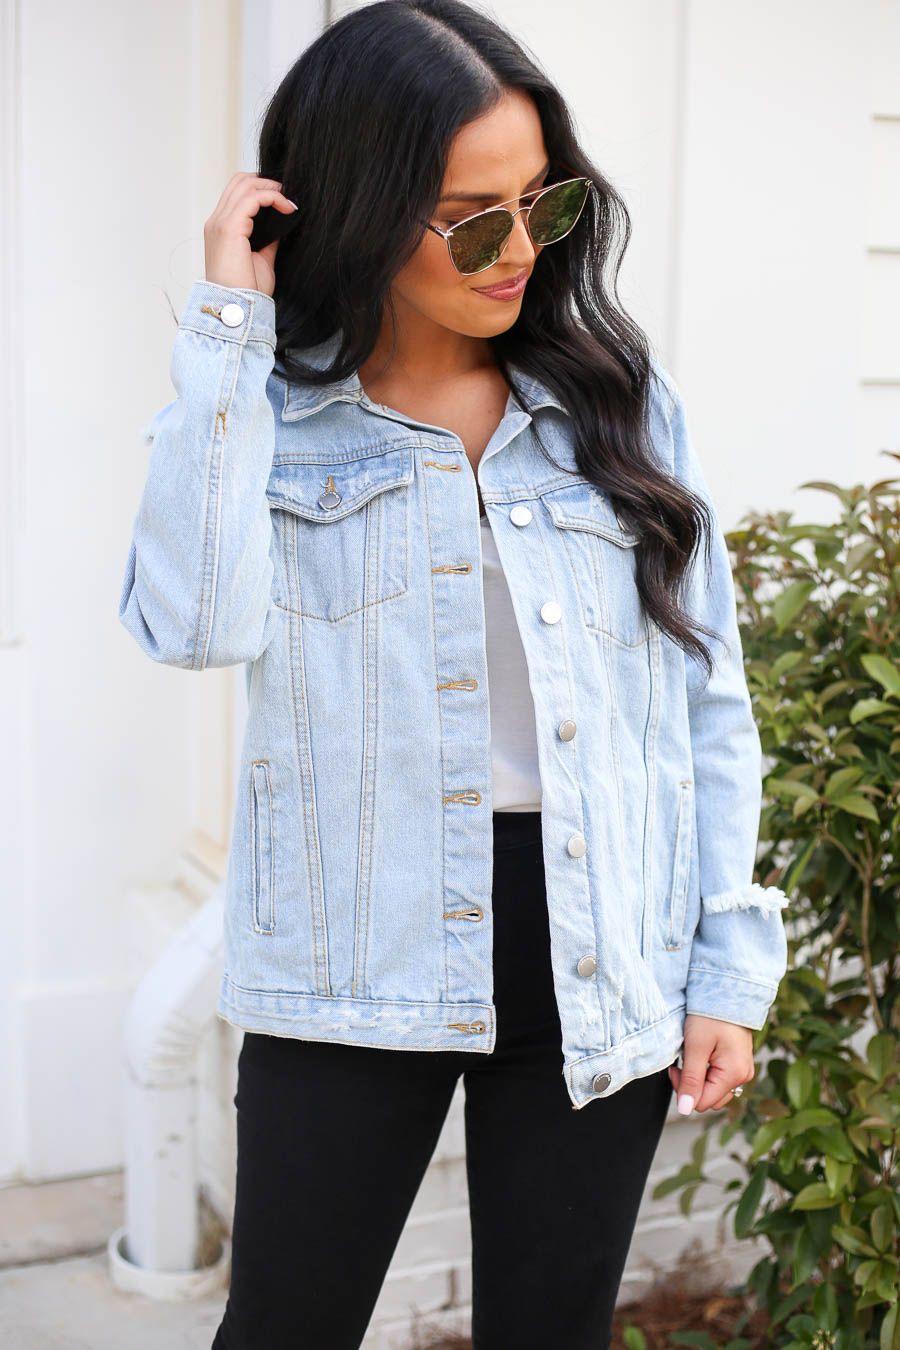 New Lydia Oversized Denim Jacket Denimjacket Blue Denim Jacket Outfit Denim Jacket Outfit Lookbook Outfits [ 1350 x 900 Pixel ]